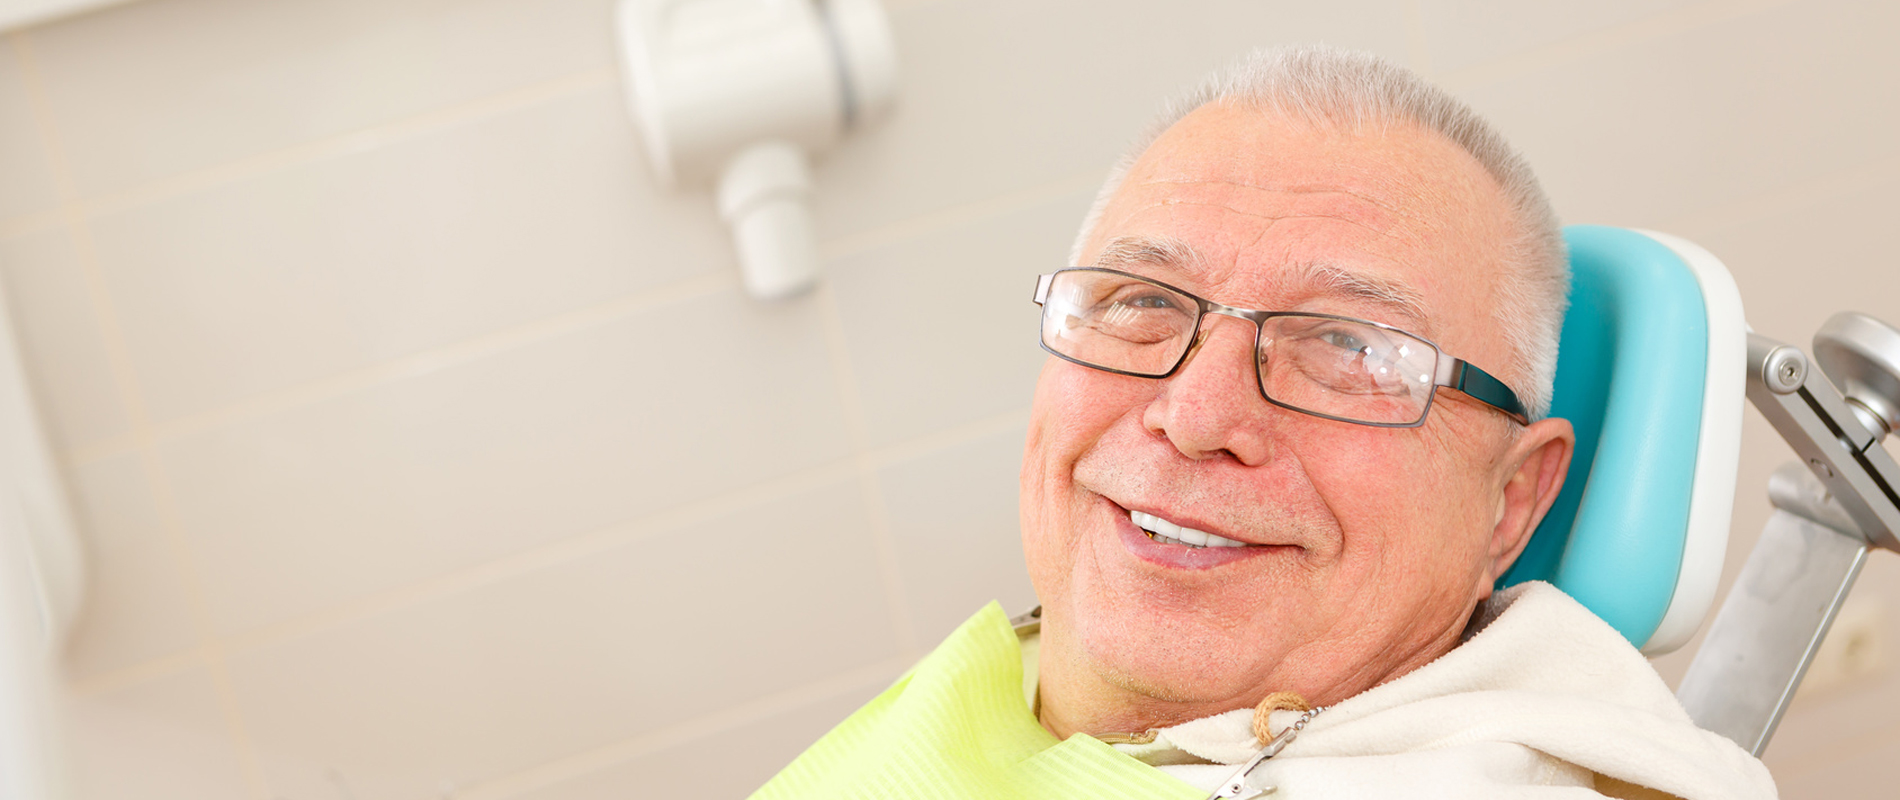 Elder in Dental Chair